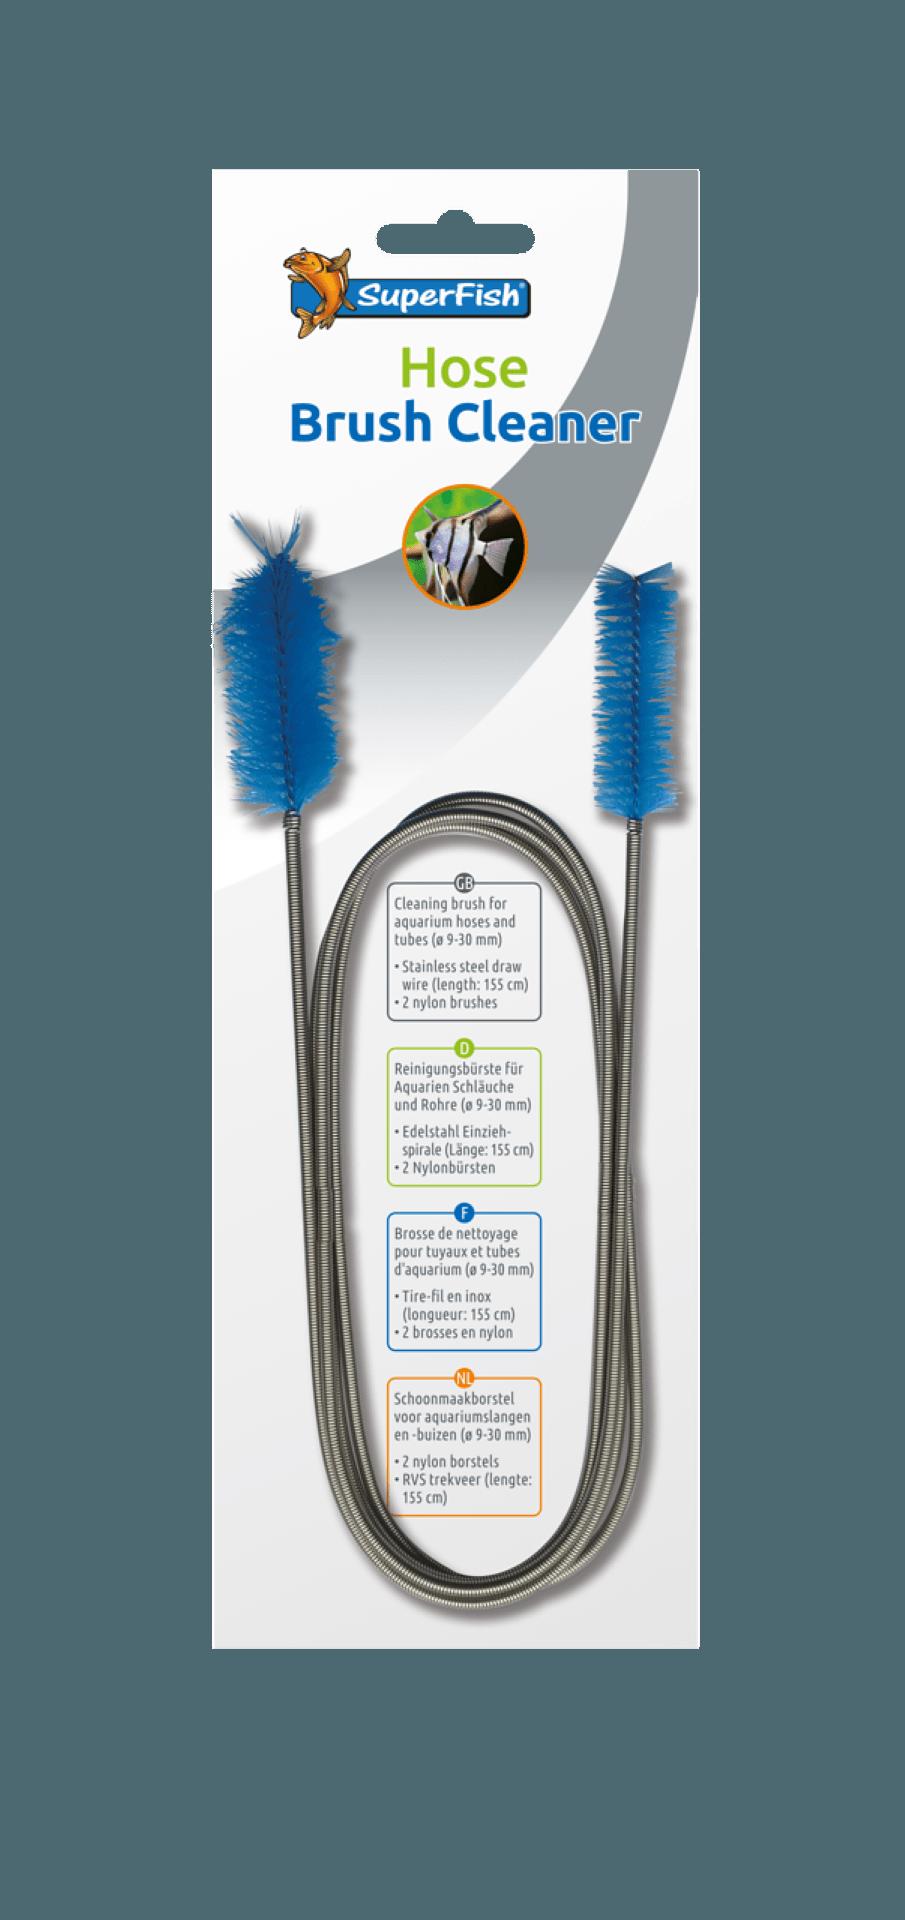 Superfish hose brush cleaner